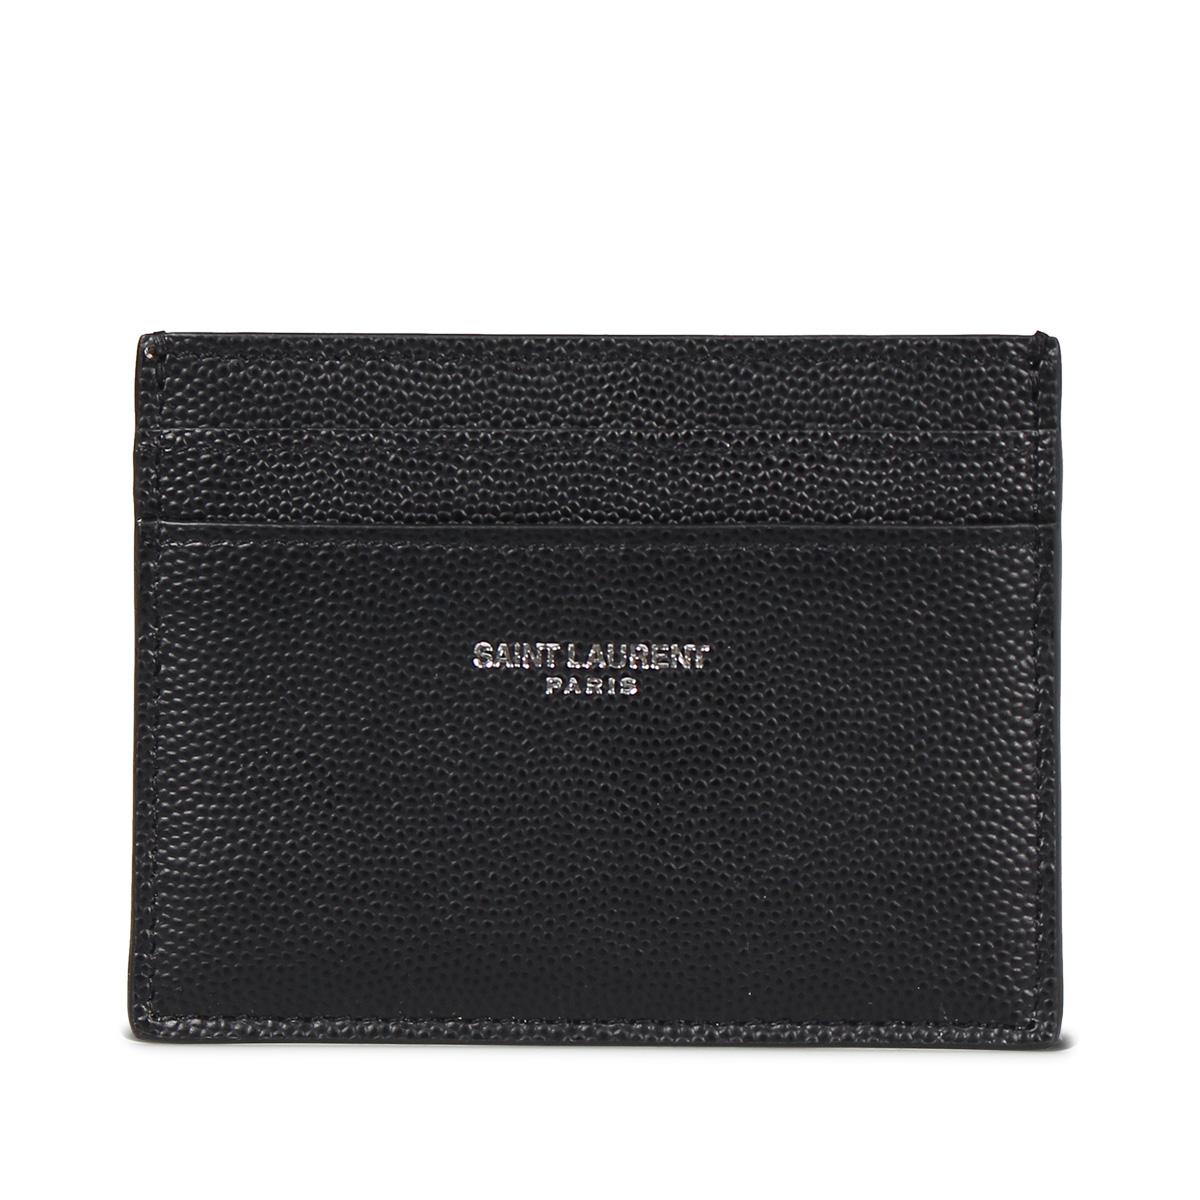 SAINT LAURENT PARIS YSL CREDIT CARD CASE サンローラン パリ パスケース カードケース ID 定期入れ メンズ 本革 ブラック 黒 375946BTY0N